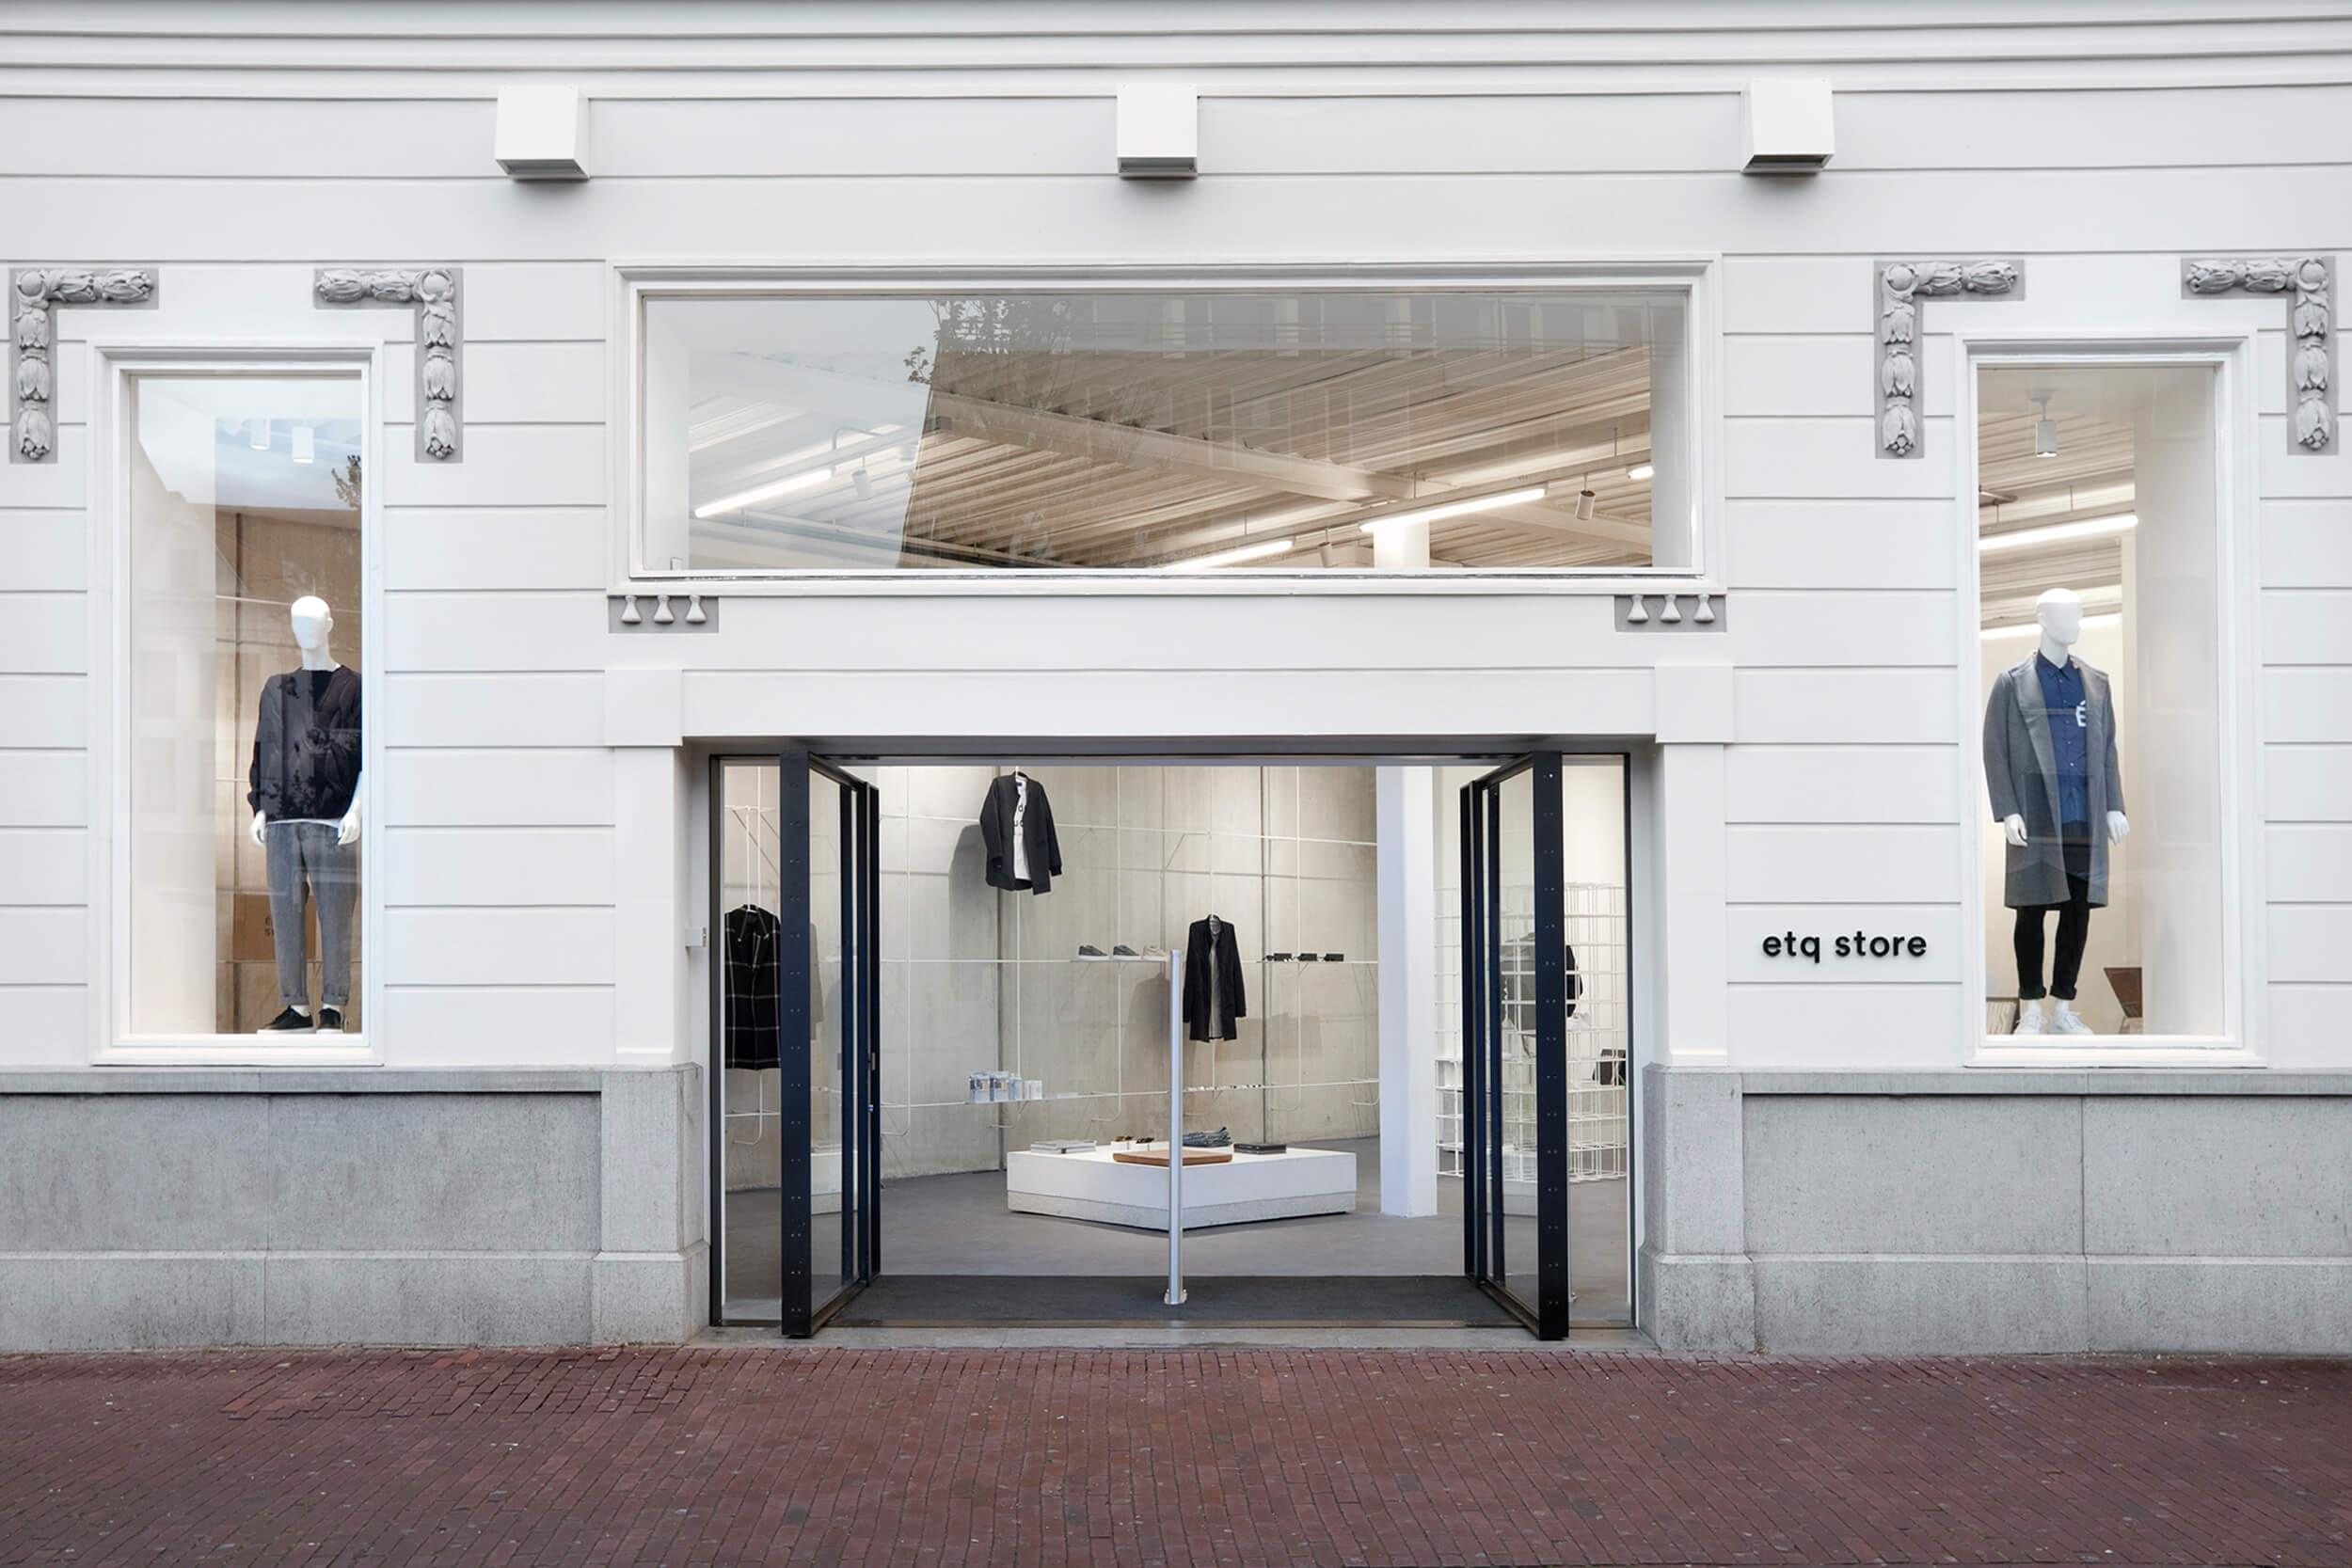 Amsterdam Shoppen Manman Etqstore Amsterdam Shoppen rrqxzdaw